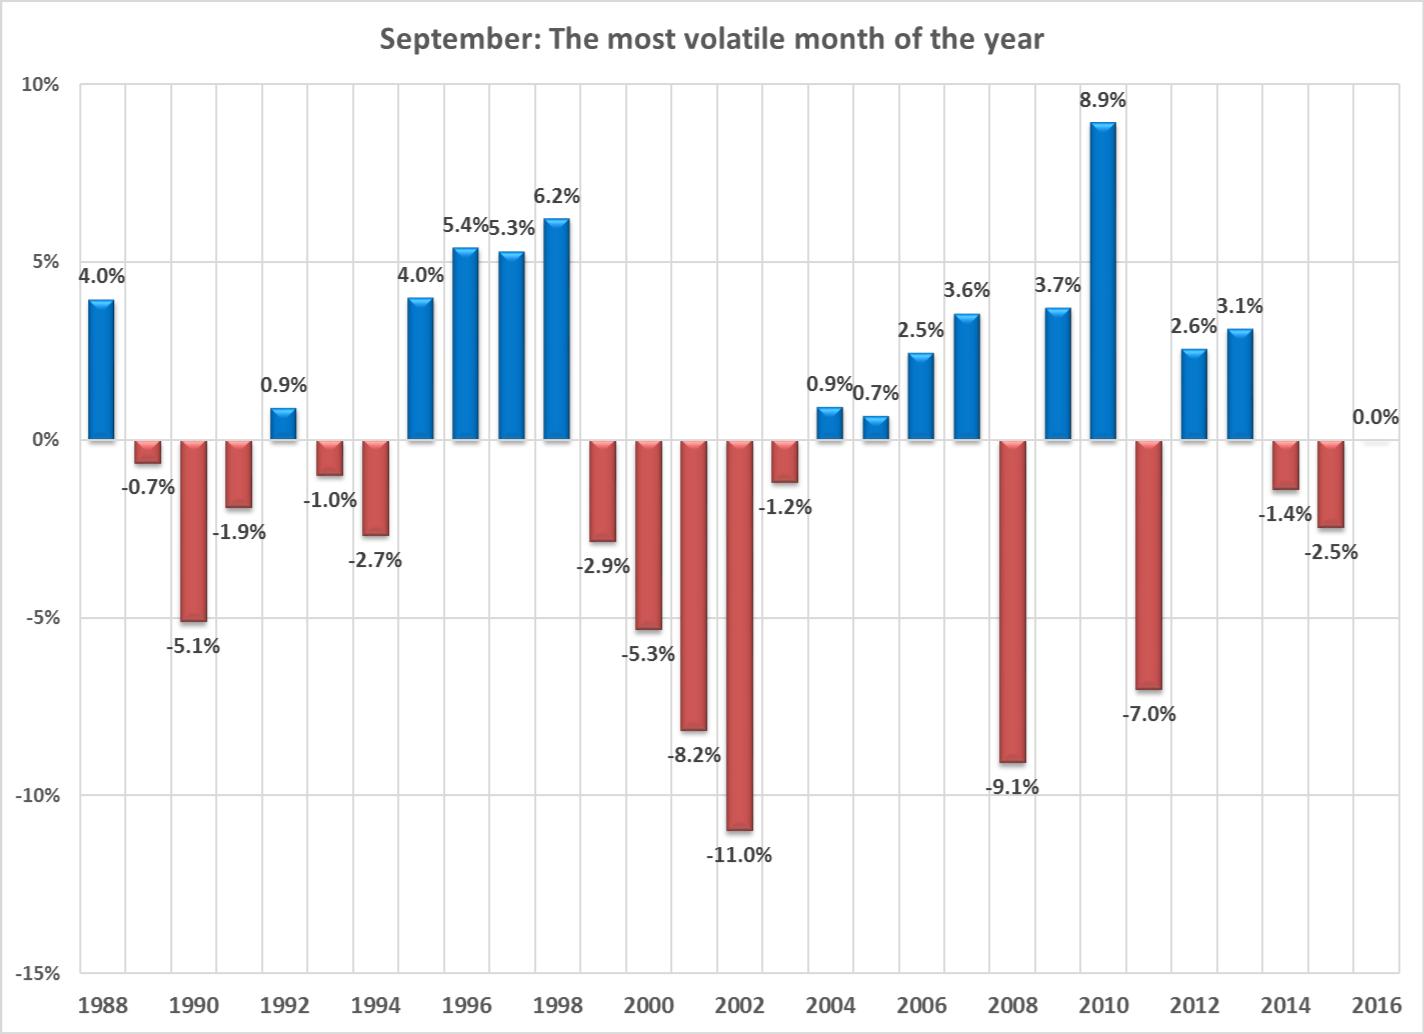 A Volatile Month